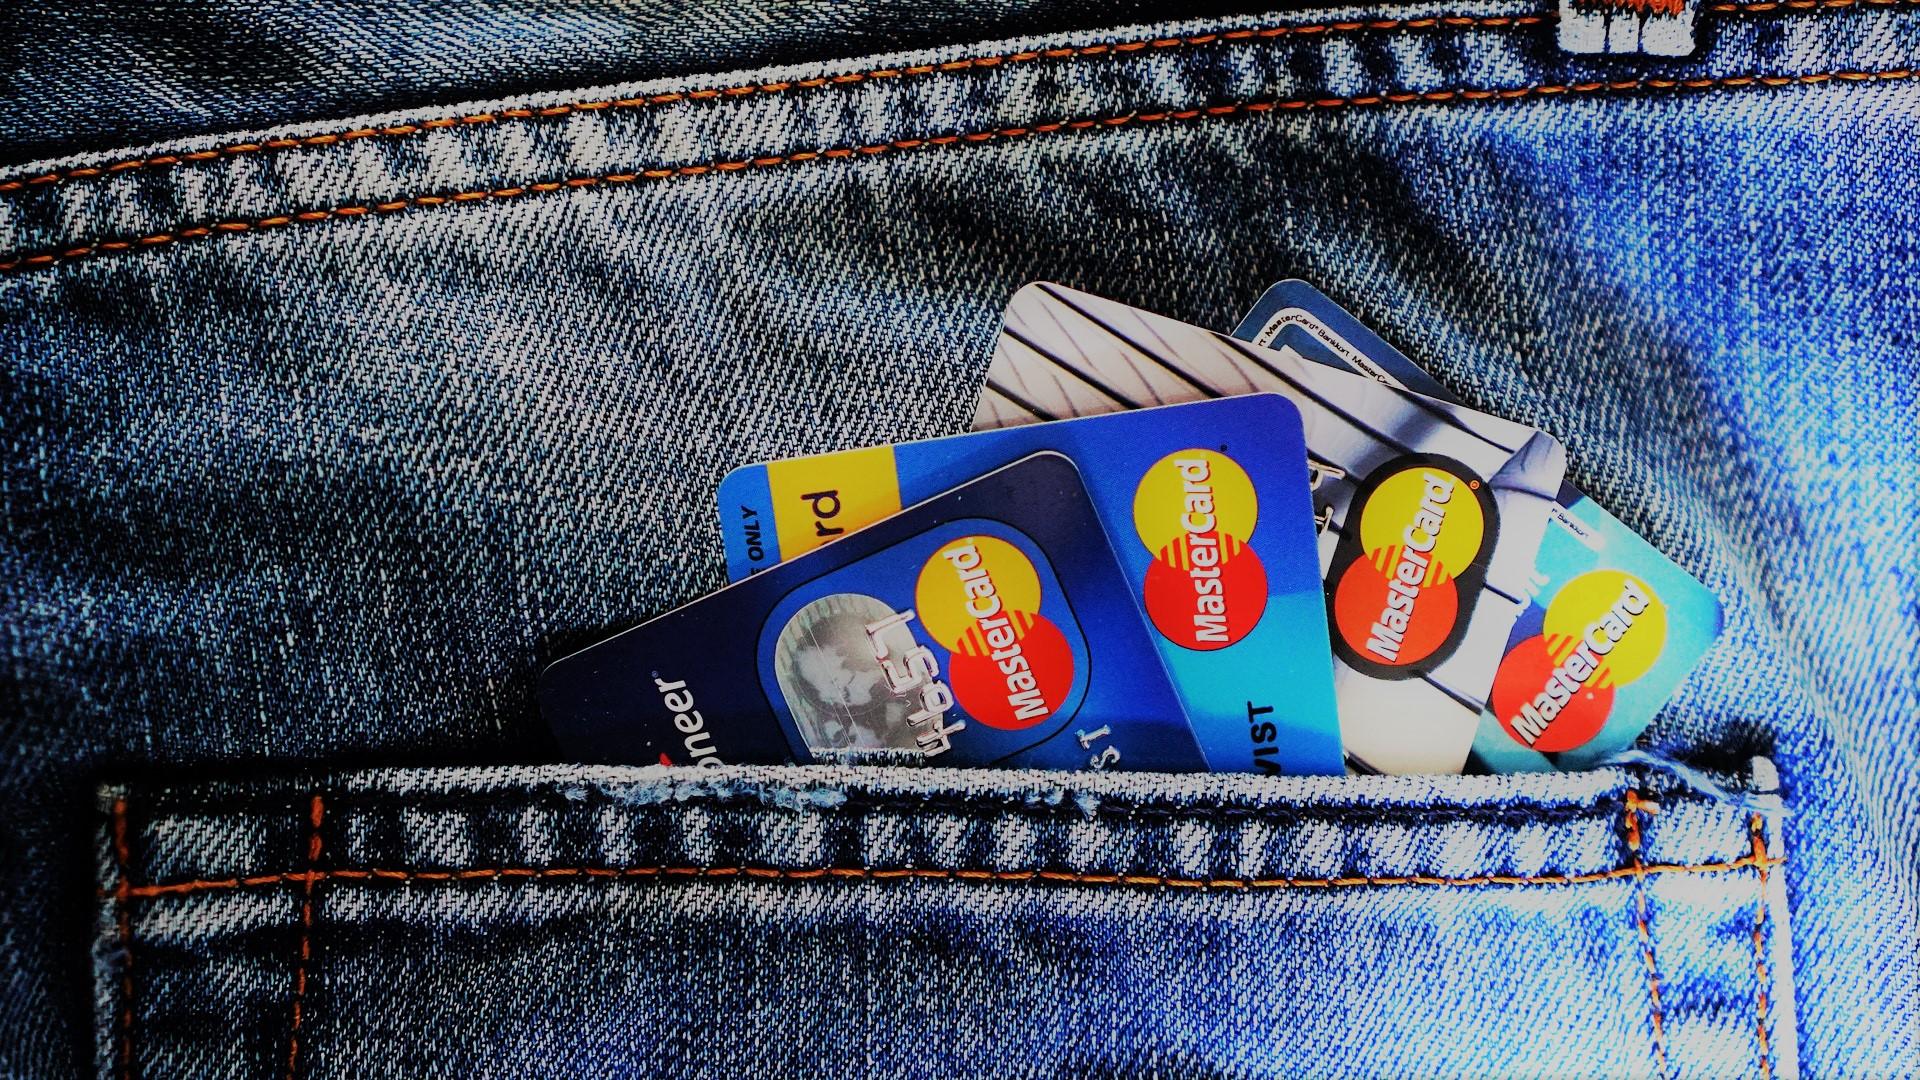 Credit Card, Crazy Card or Creative Card??